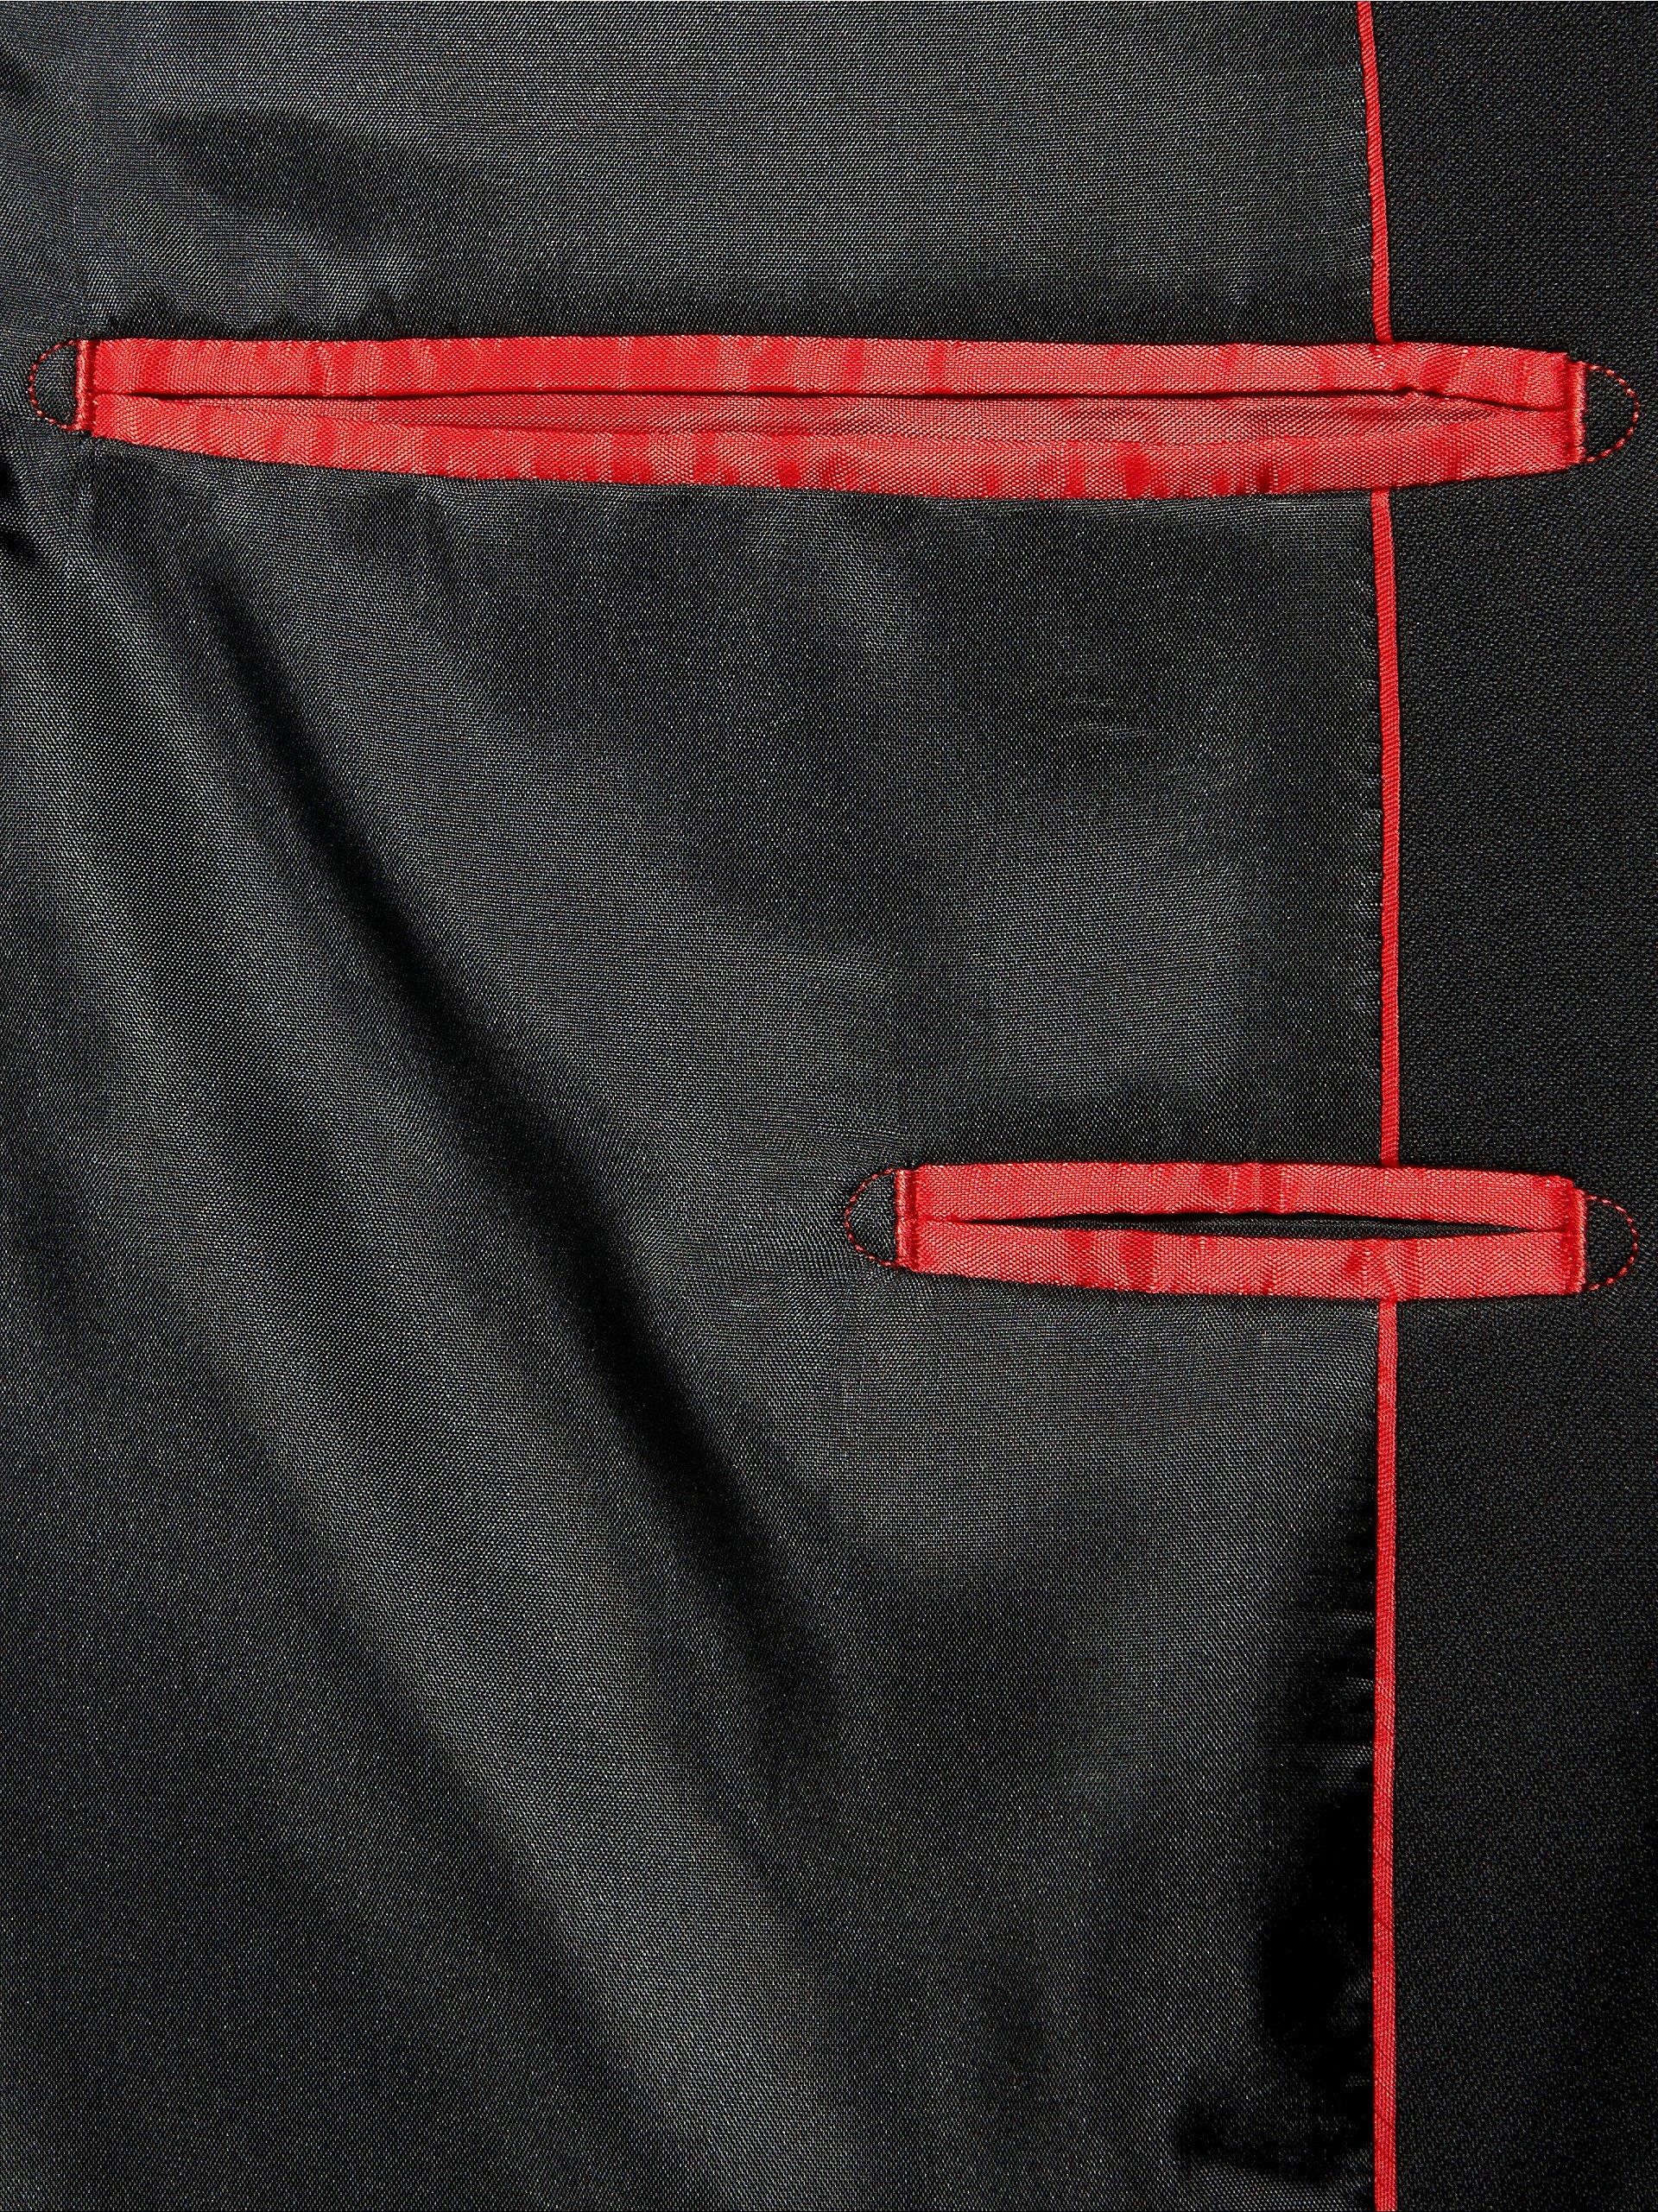 Finshley & Harding Herren Baukasten-Sakko - Red Label